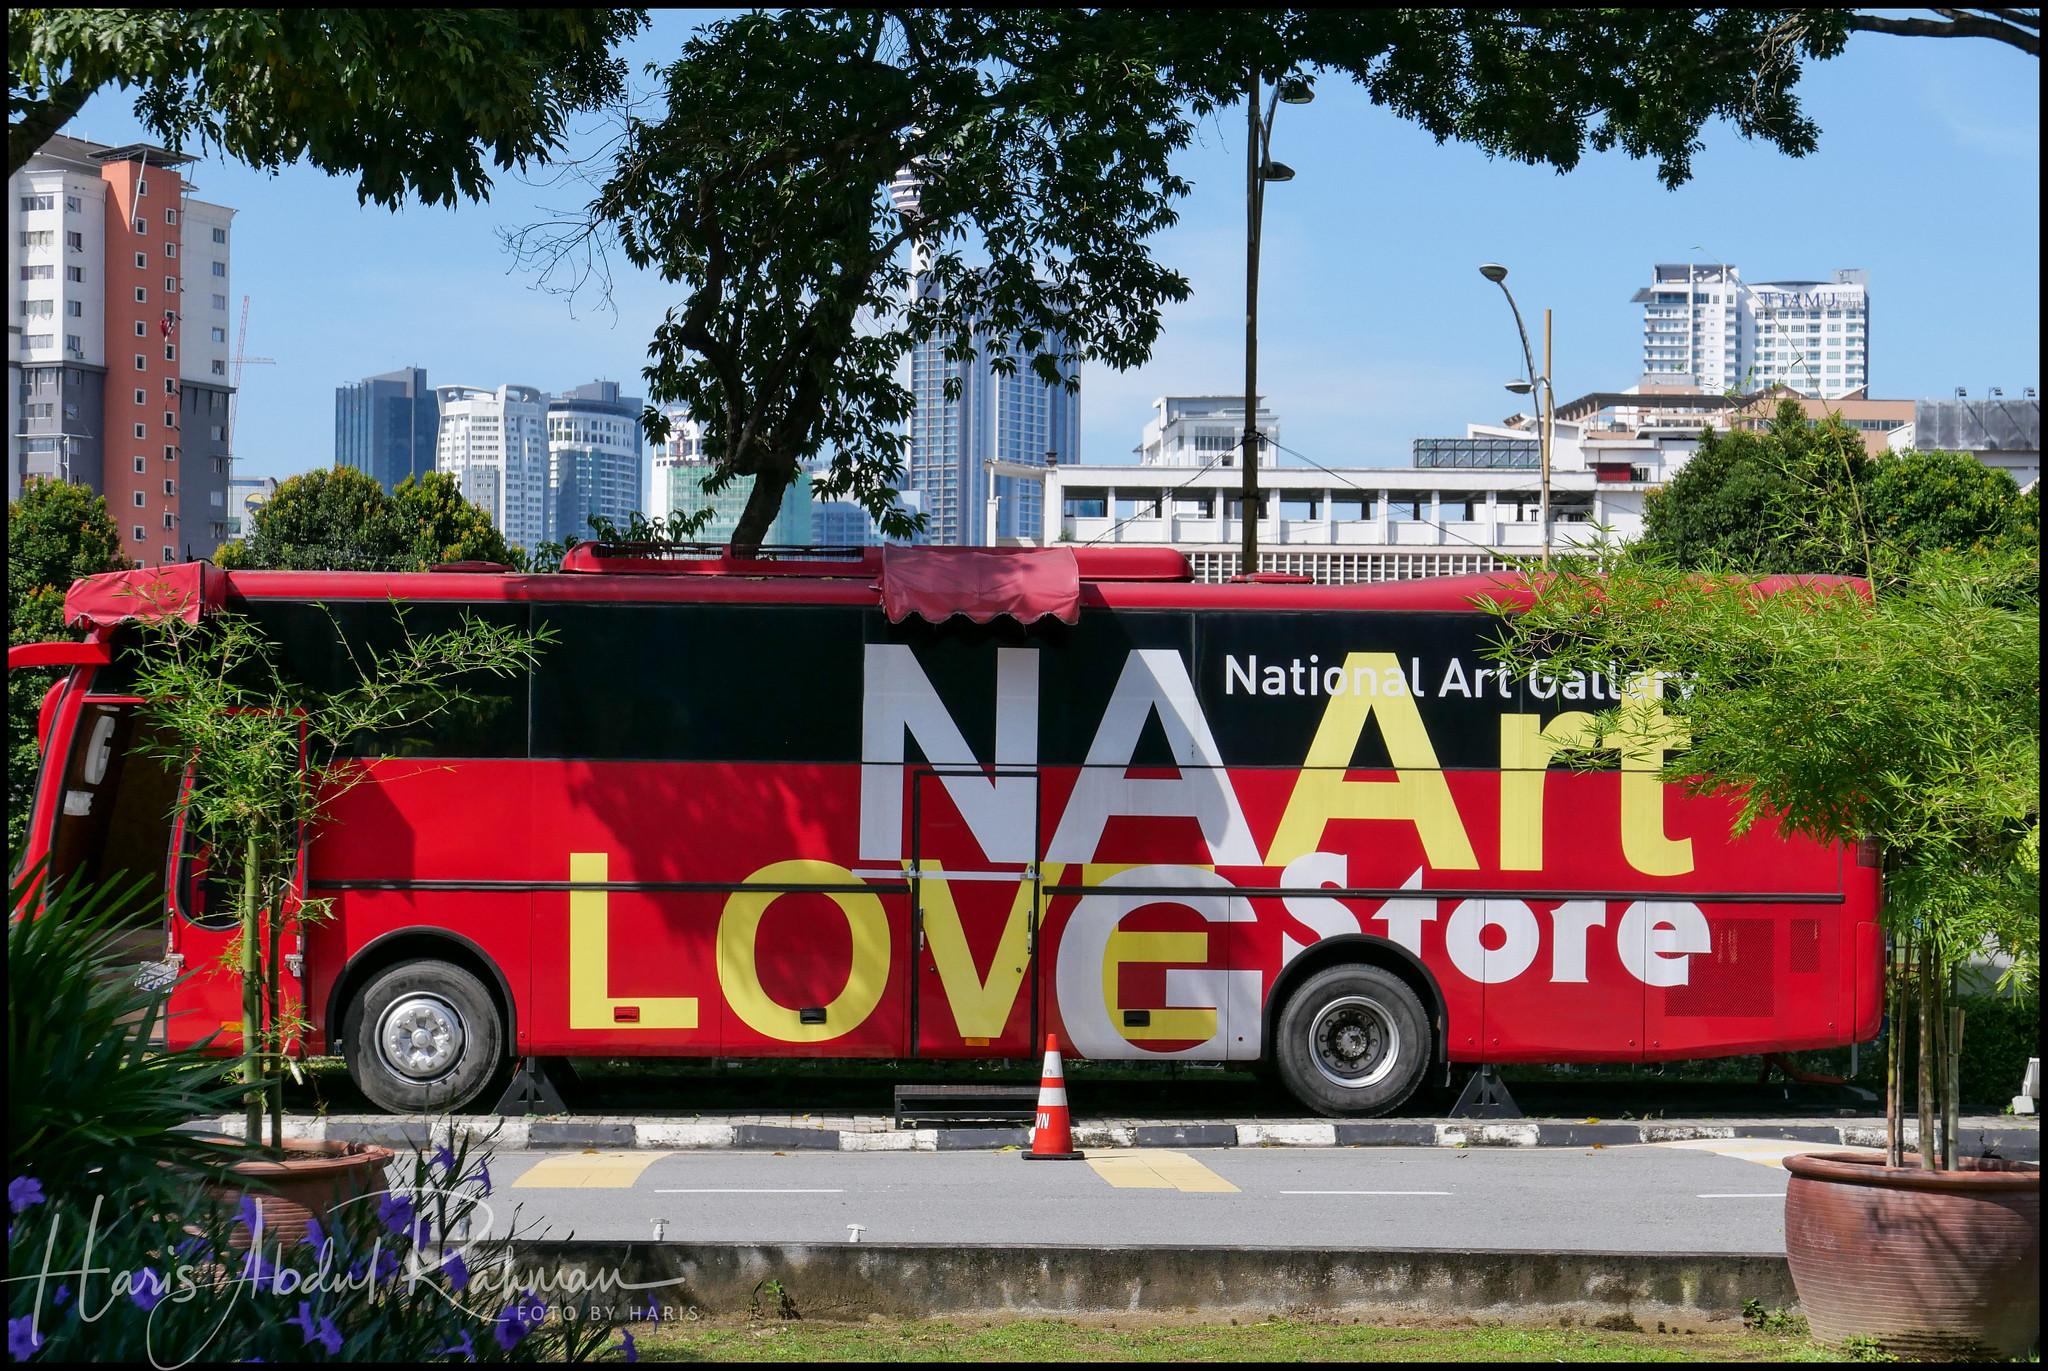 That's a rather fancy bus …